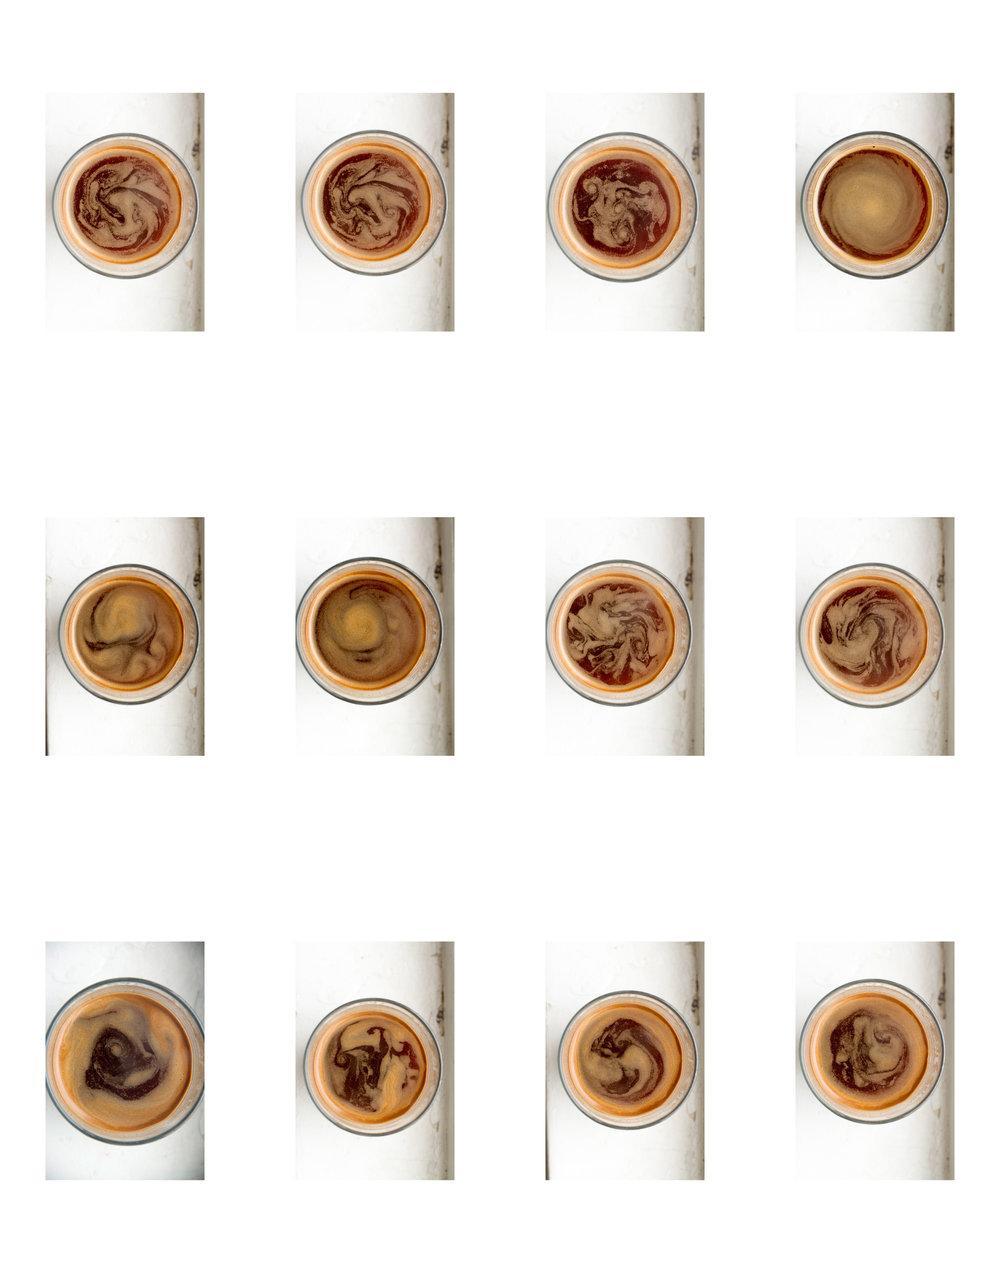 Cafe-001.jpg